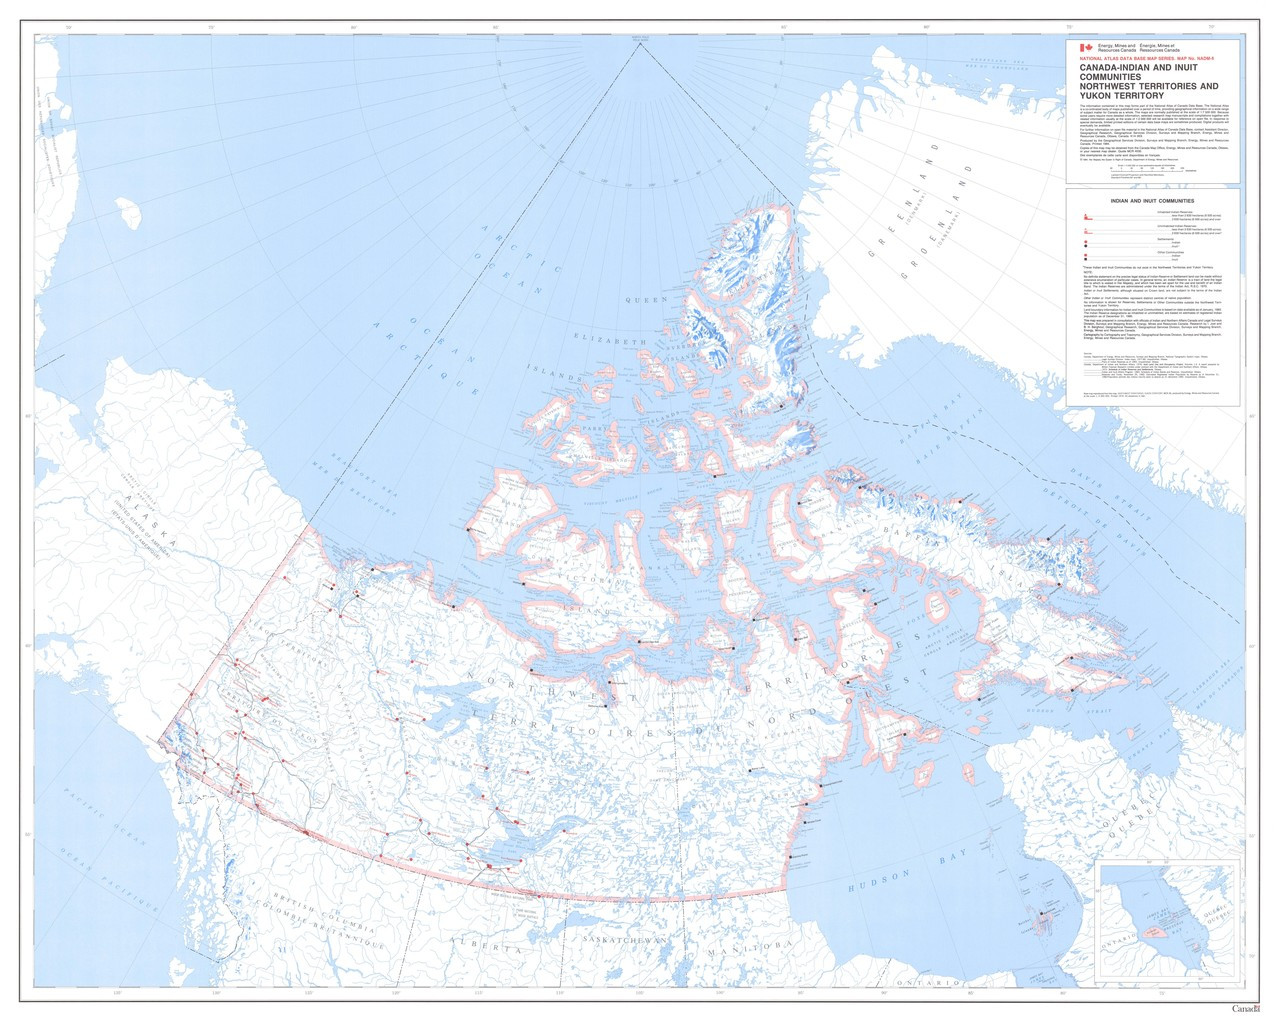 Canada Indian Inuit Communities Nwt Yukon Nunavut Provinces Map